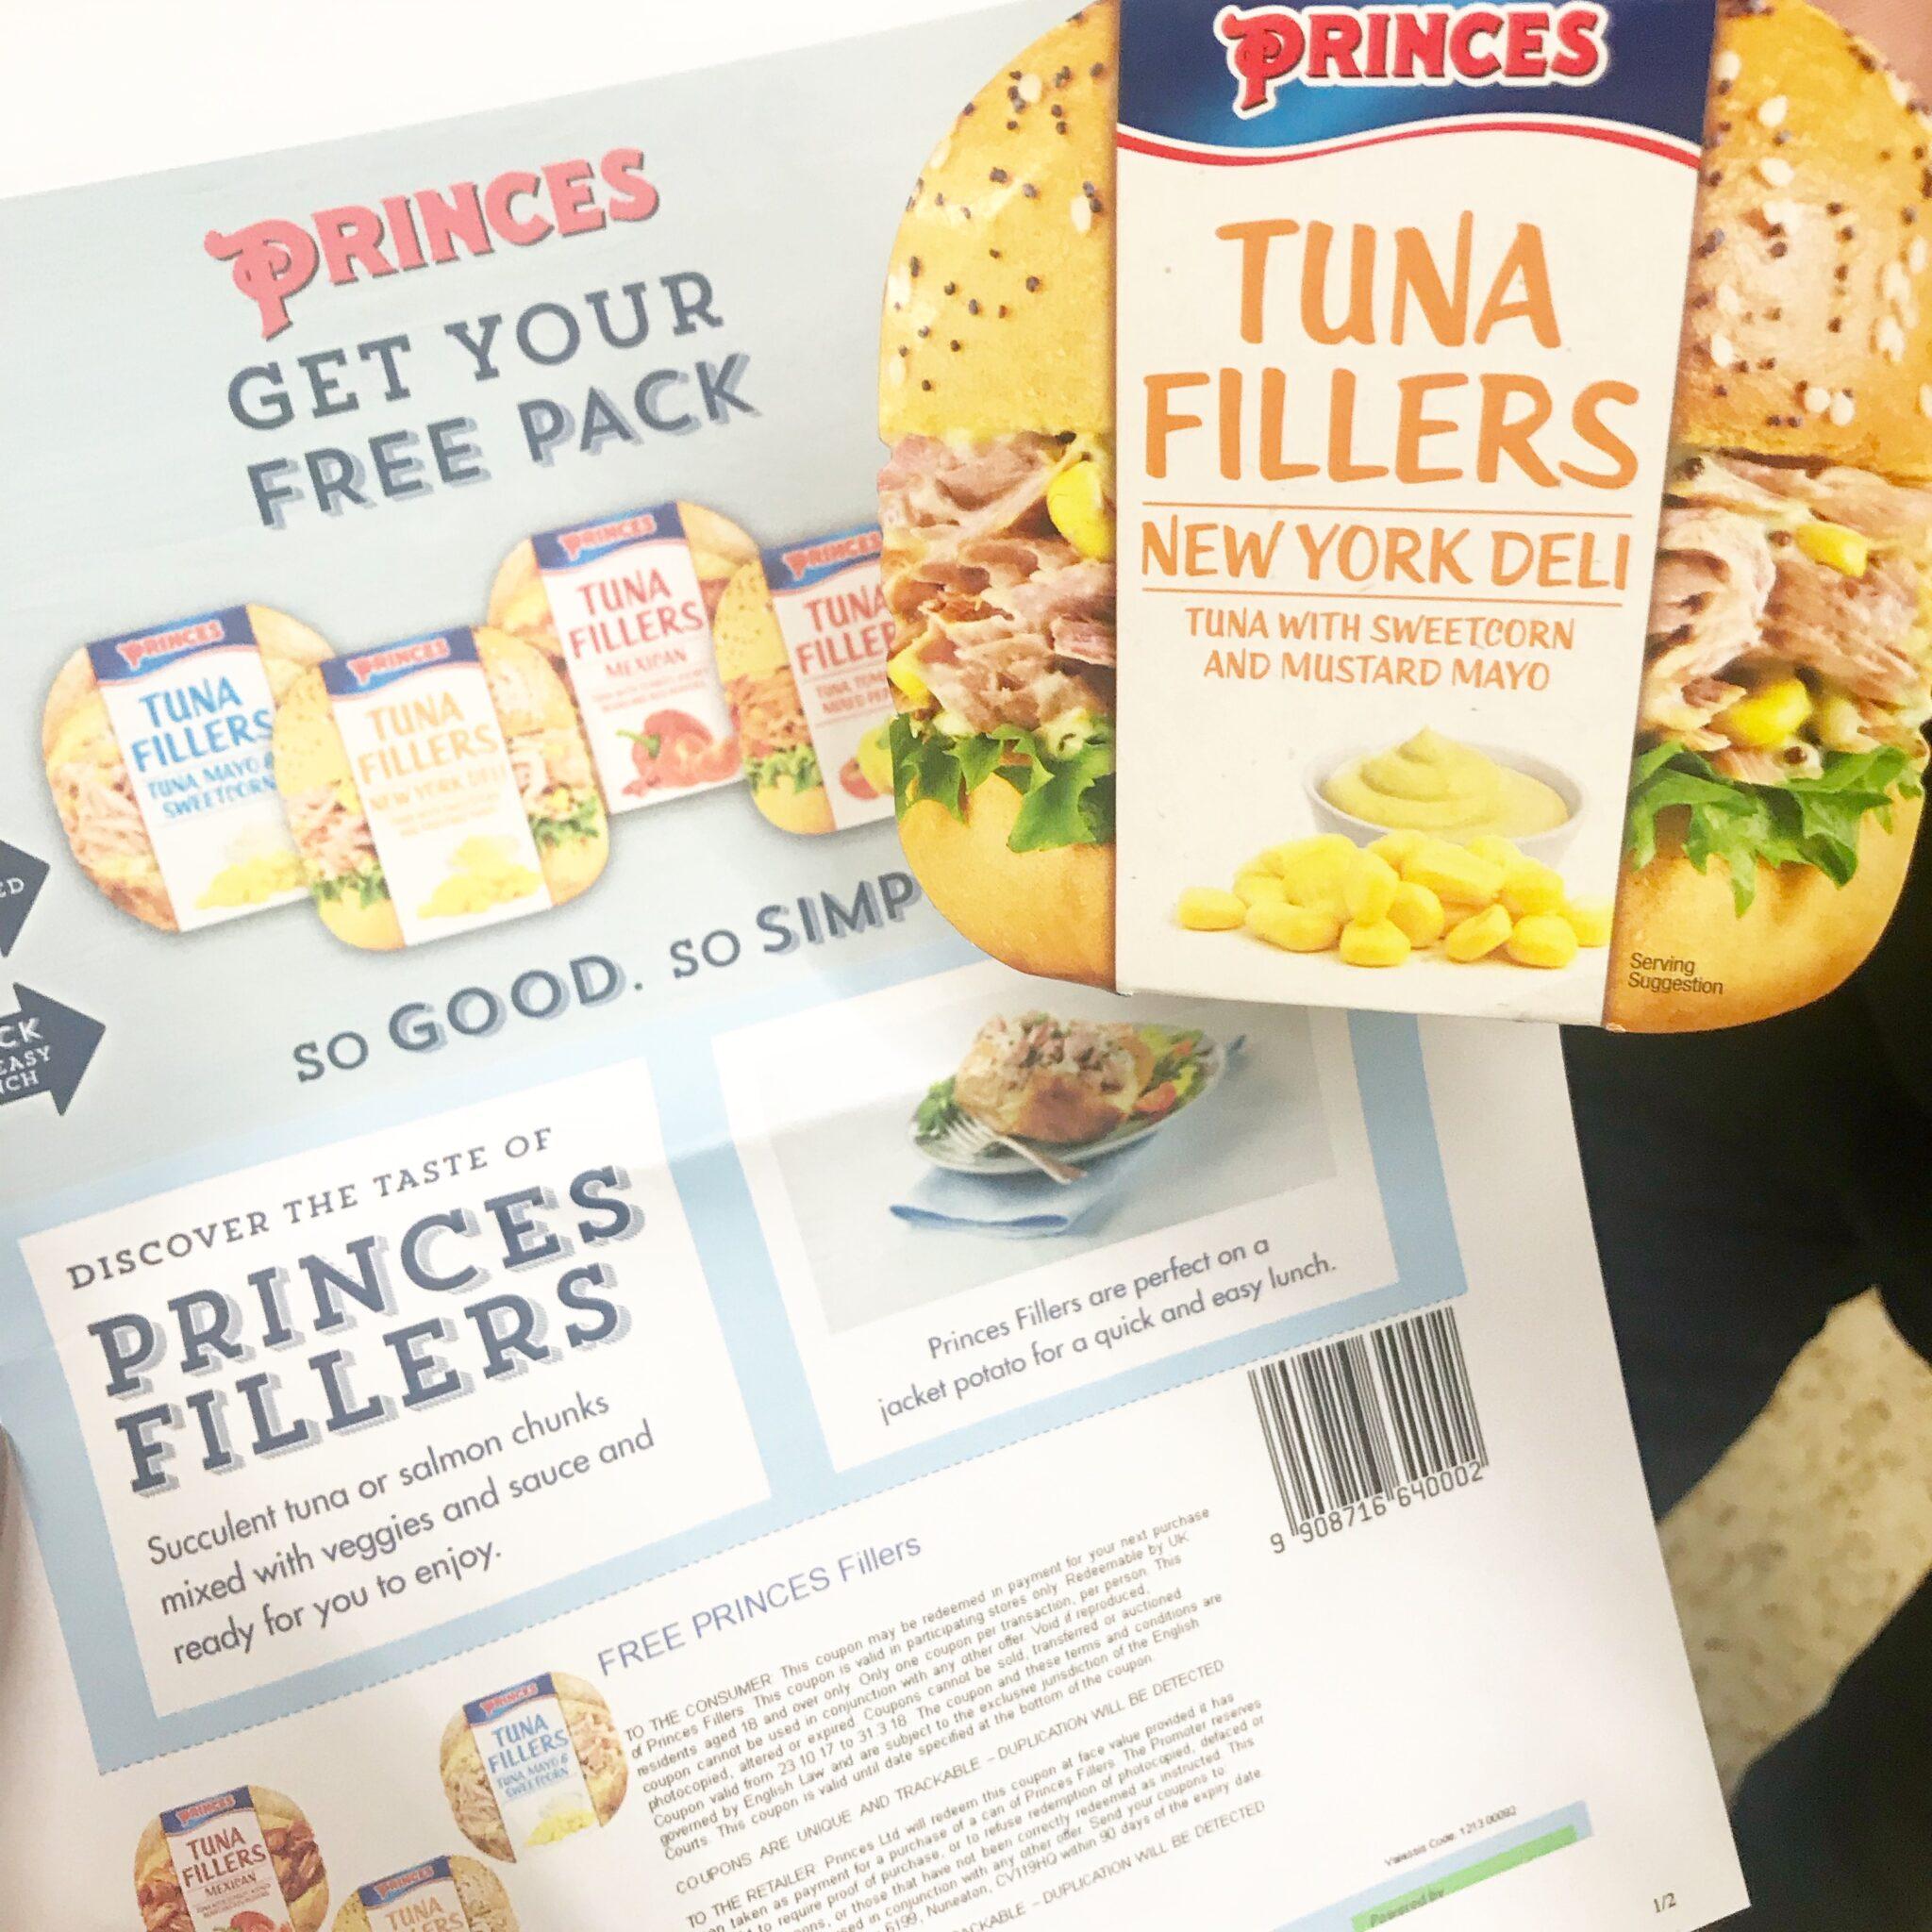 Free-Tuna-Pack-coupon